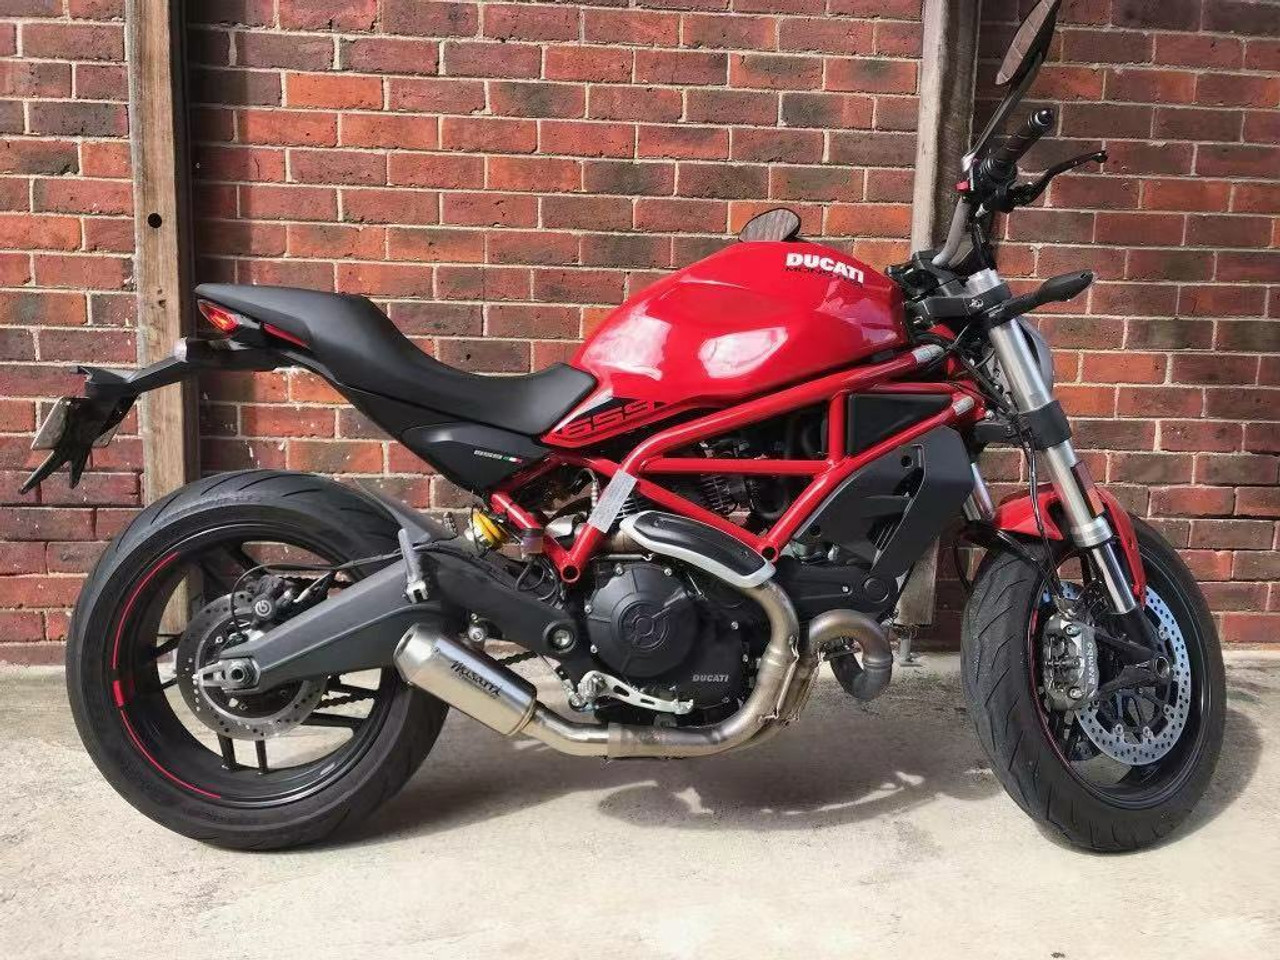 Ducati 659 Monster Musarri GP Street SS